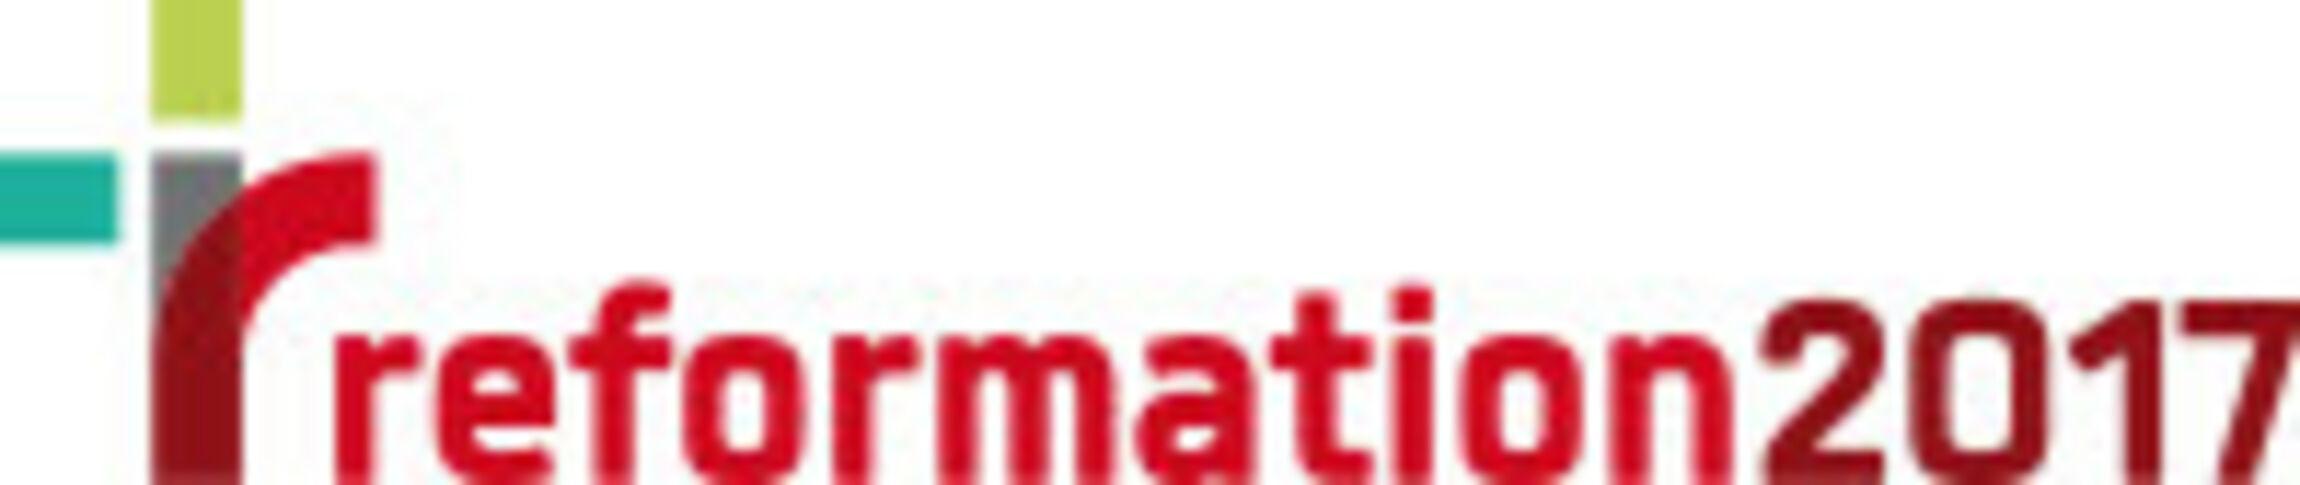 r2017-logo